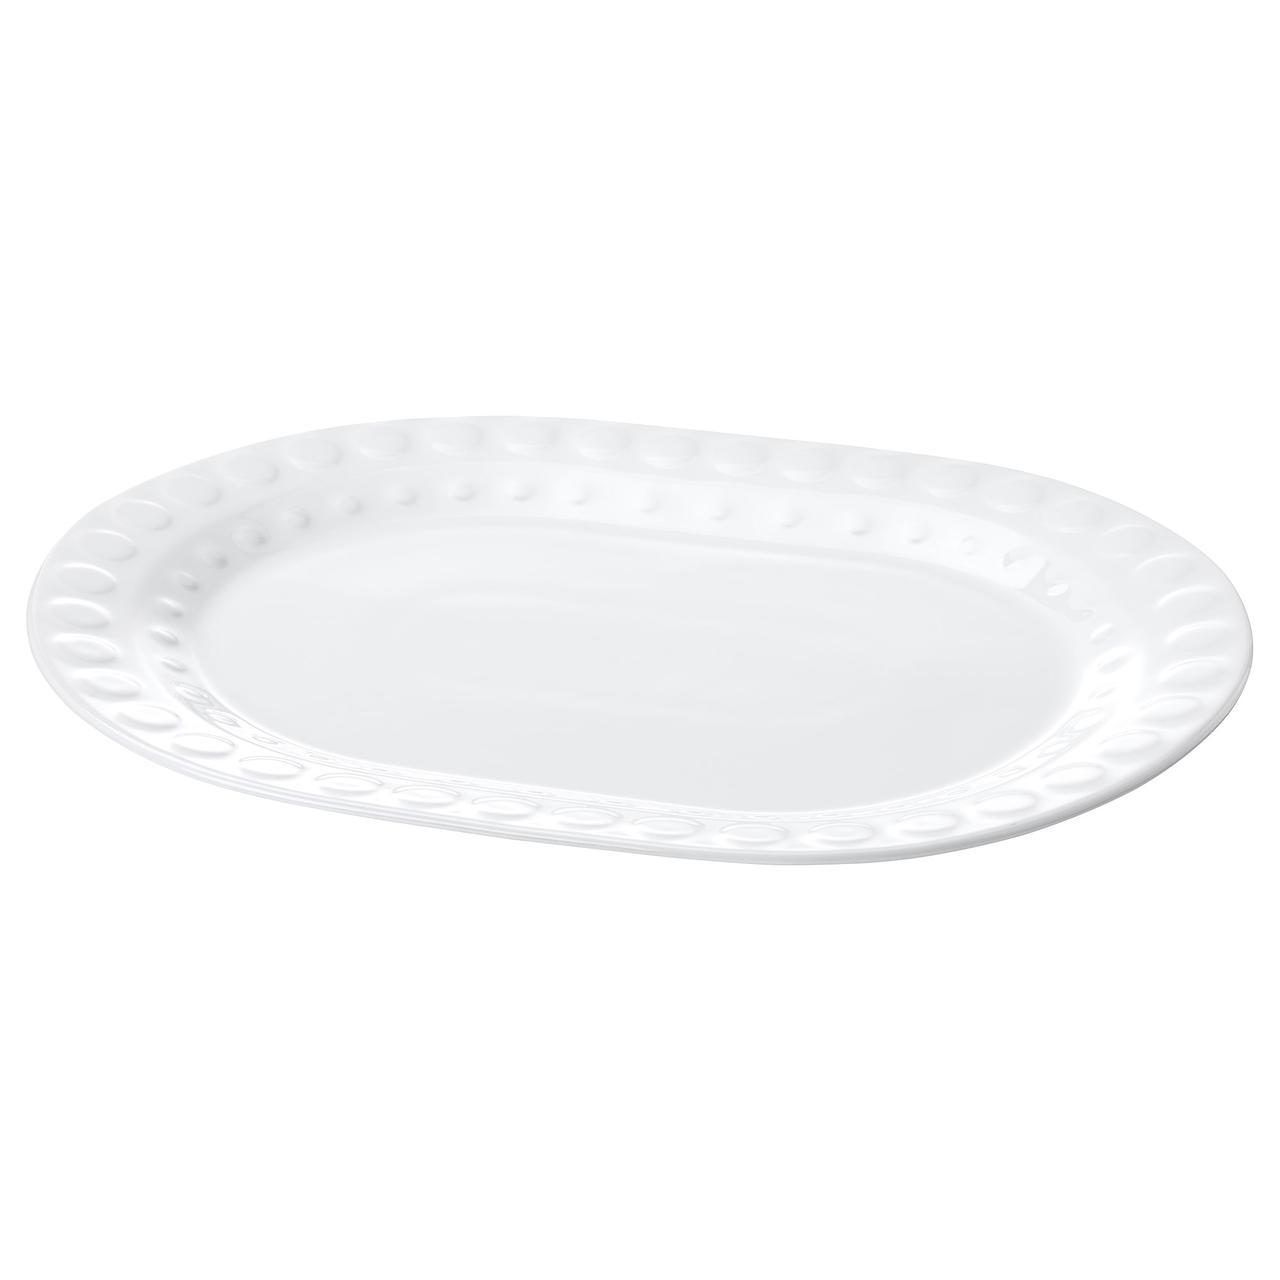 СОММАР 2019 Блюдо, белый